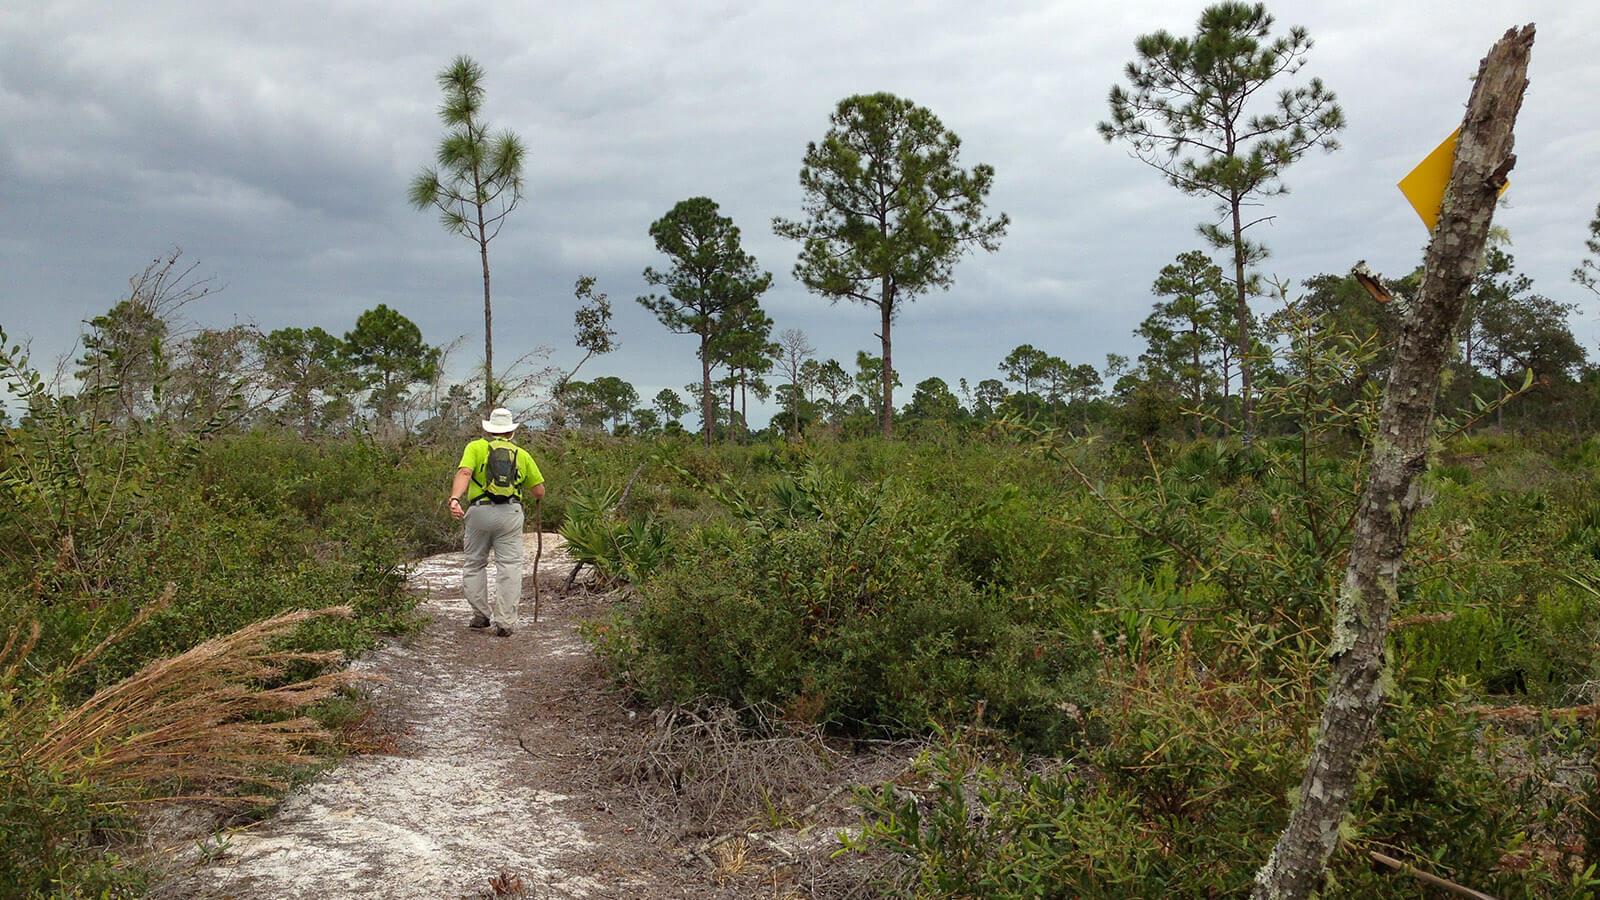 John hiking on sand trail between pines